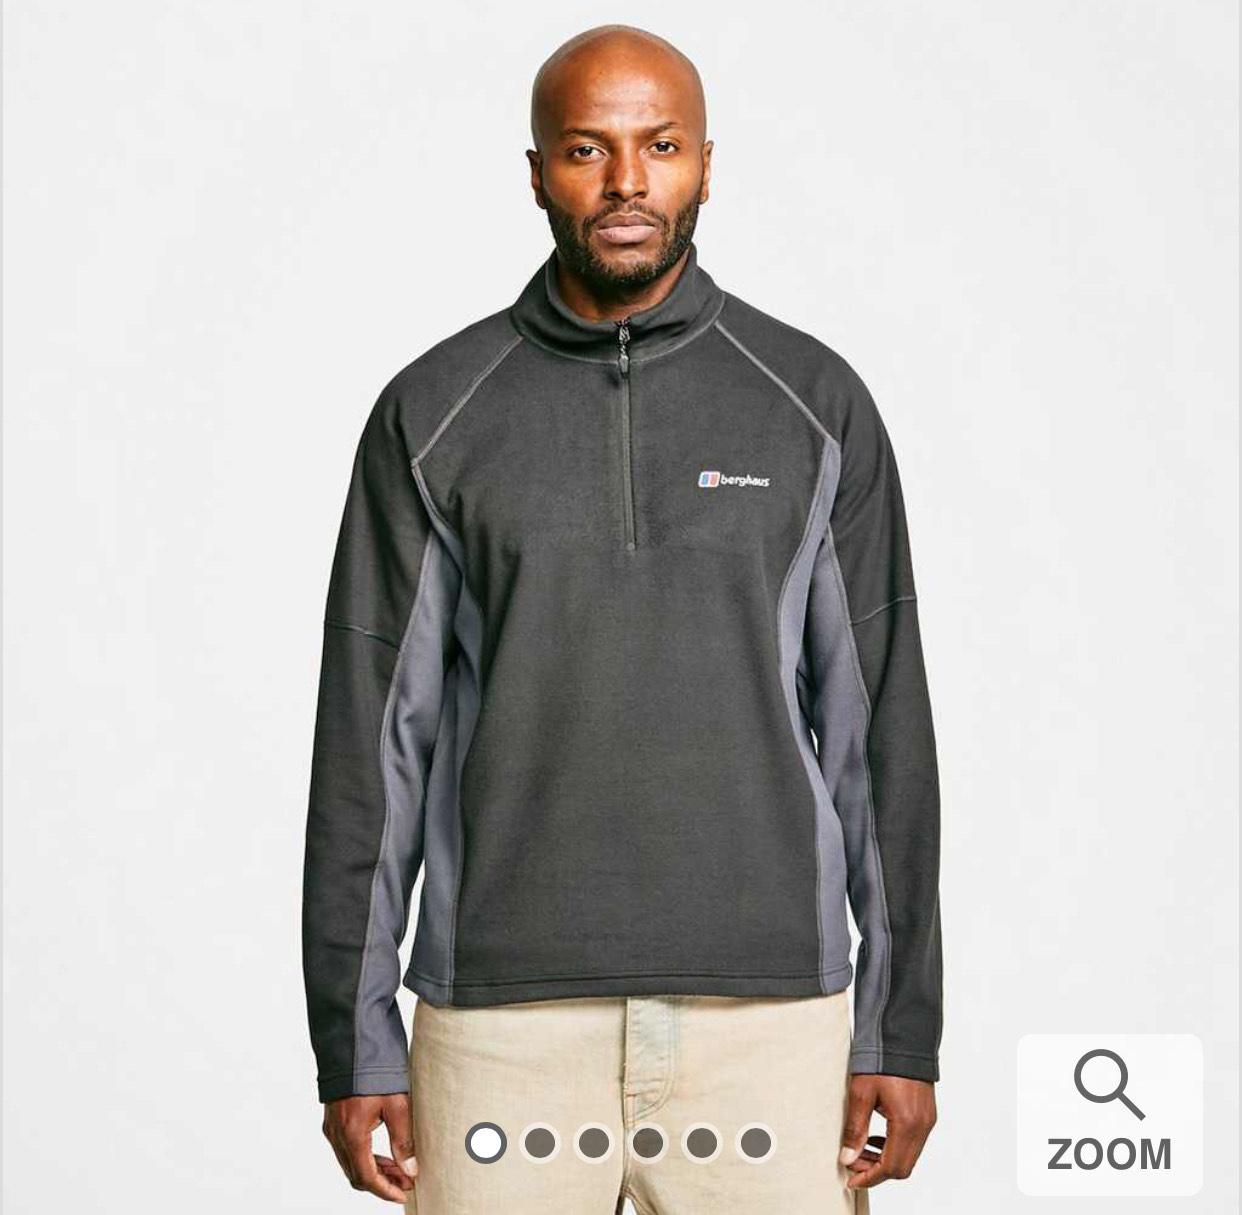 Berghaus Men's Hartsop Half-Zip Micro Fleece Black/Khaki/Blue/Red - £24.65 with code delivered @ Blacks